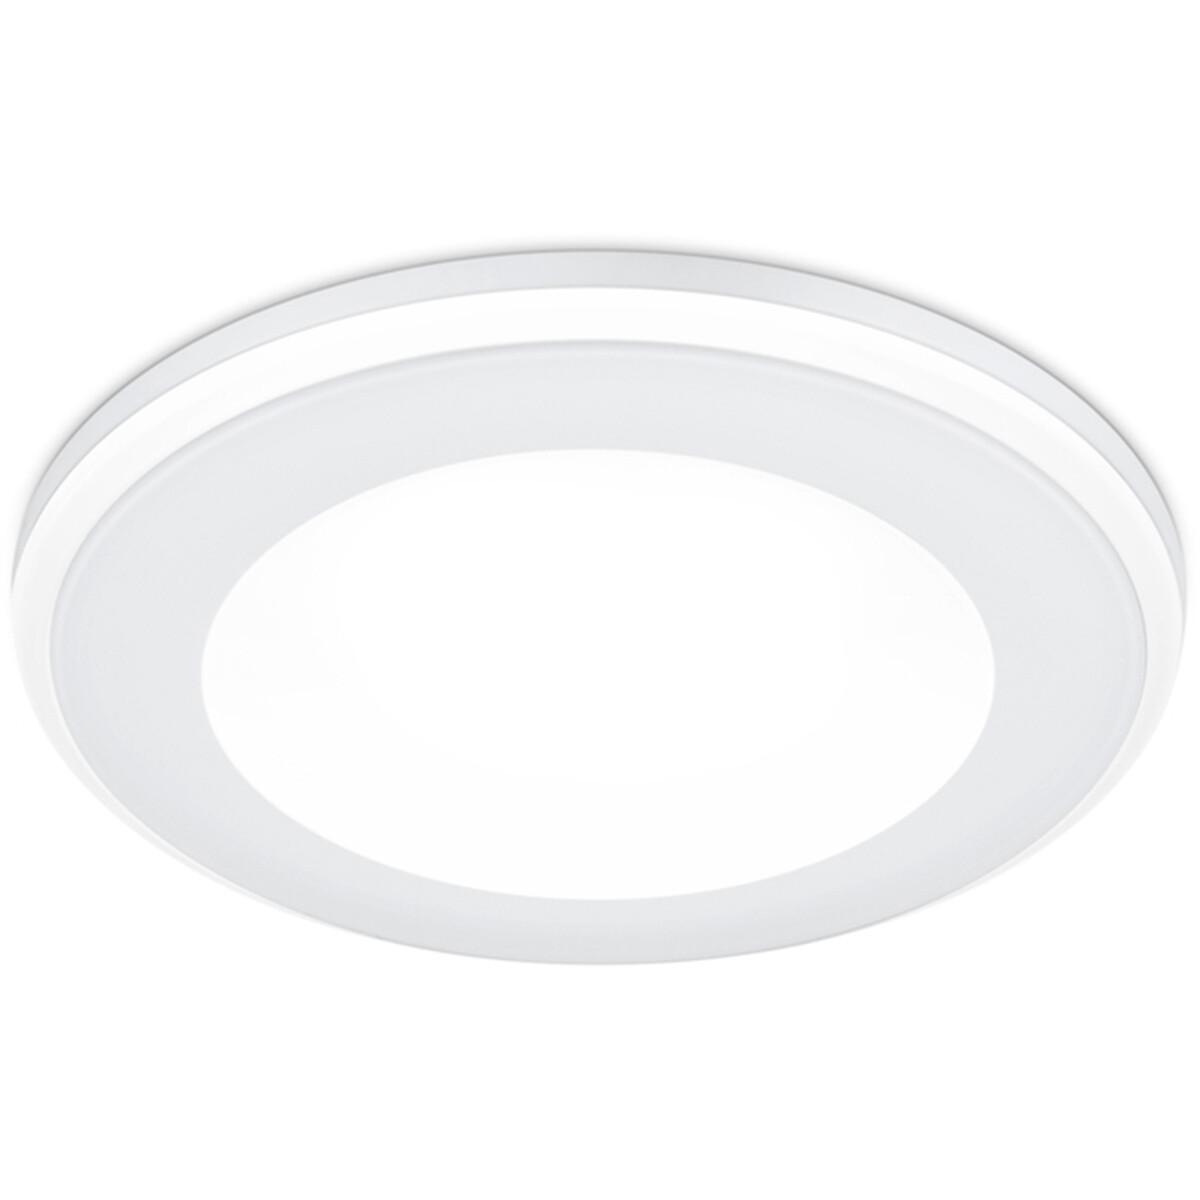 LED Spot - Inbouwspot - Trion Auran - 5W - Warm Wit 3000K - Rond - Mat Wit - Kunststof